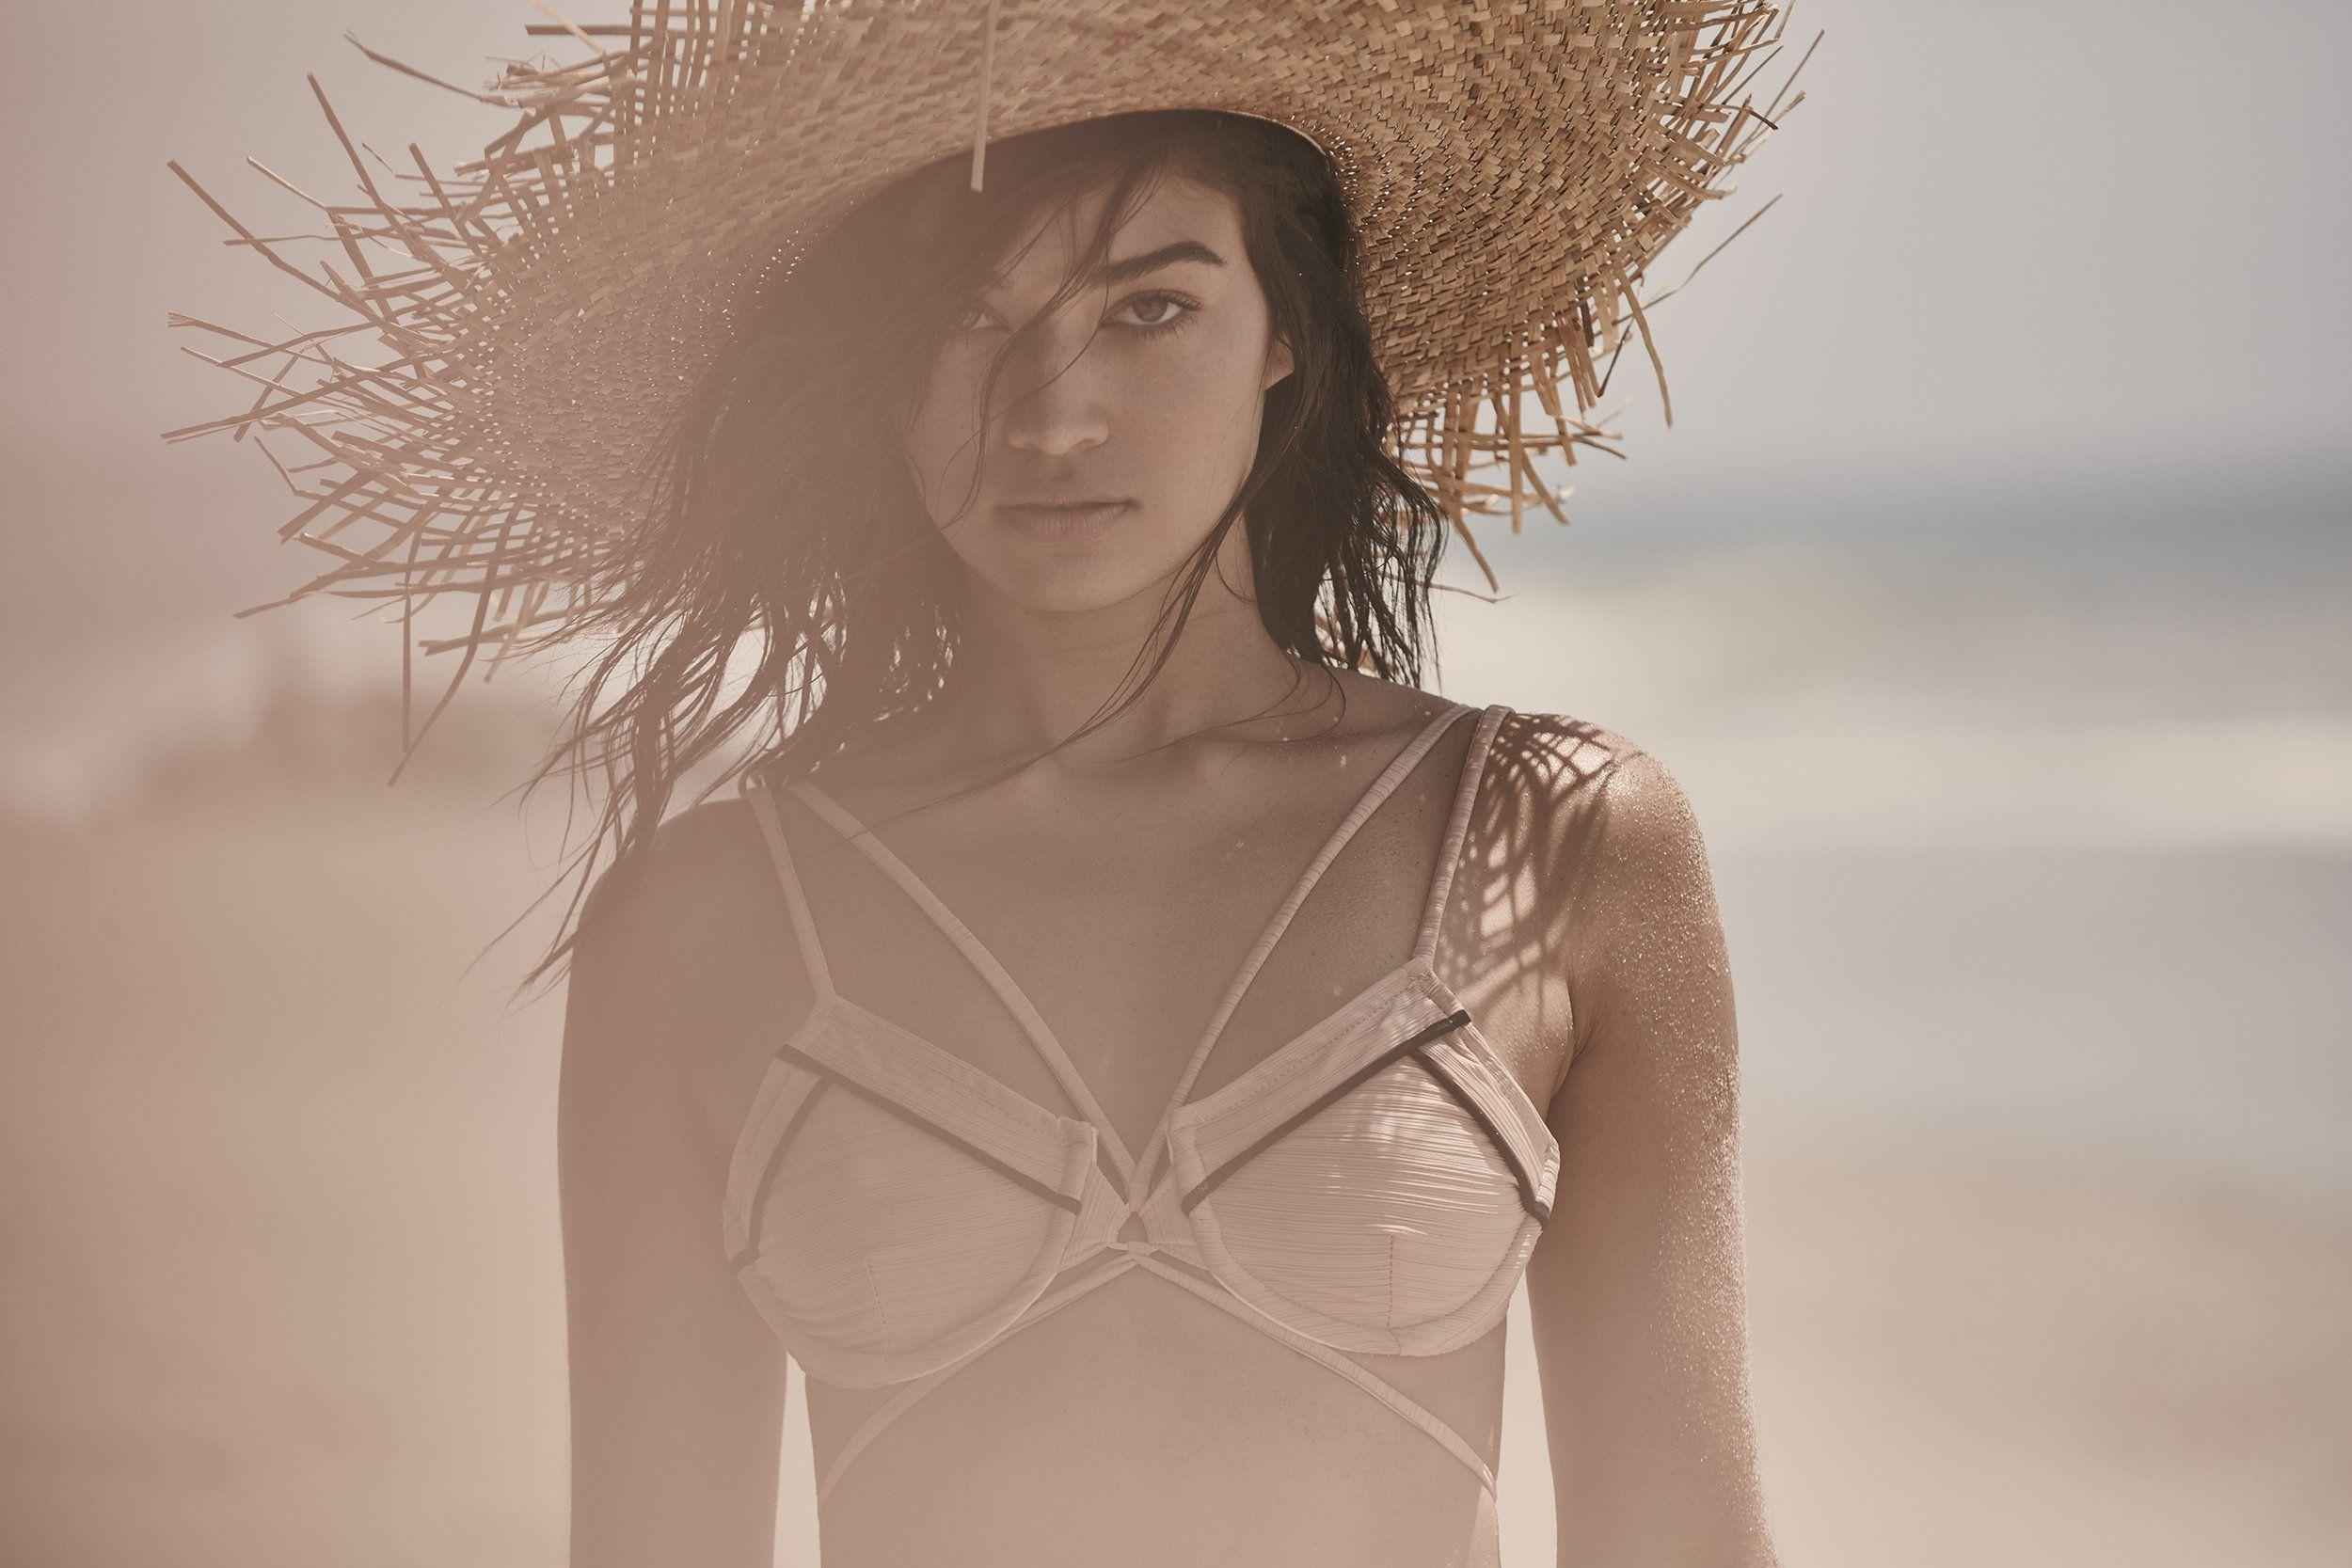 Shanina Shaik by Zoey Grossman for Love and Lemons